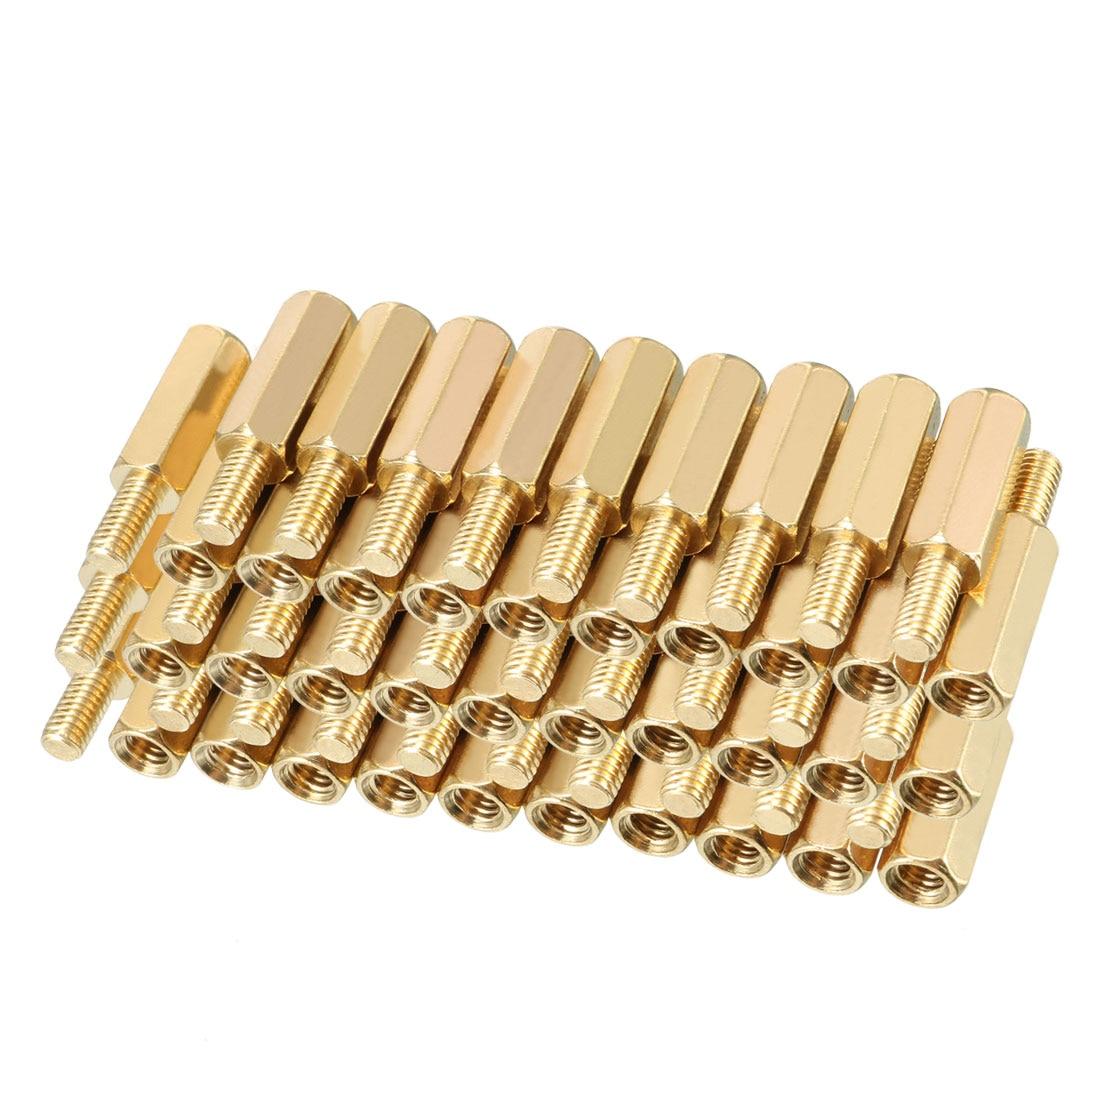 uxcell 46pcs M3 6+4mm Female Male Thread Brass Hex Standoff Spacer Screws PCB Pillar